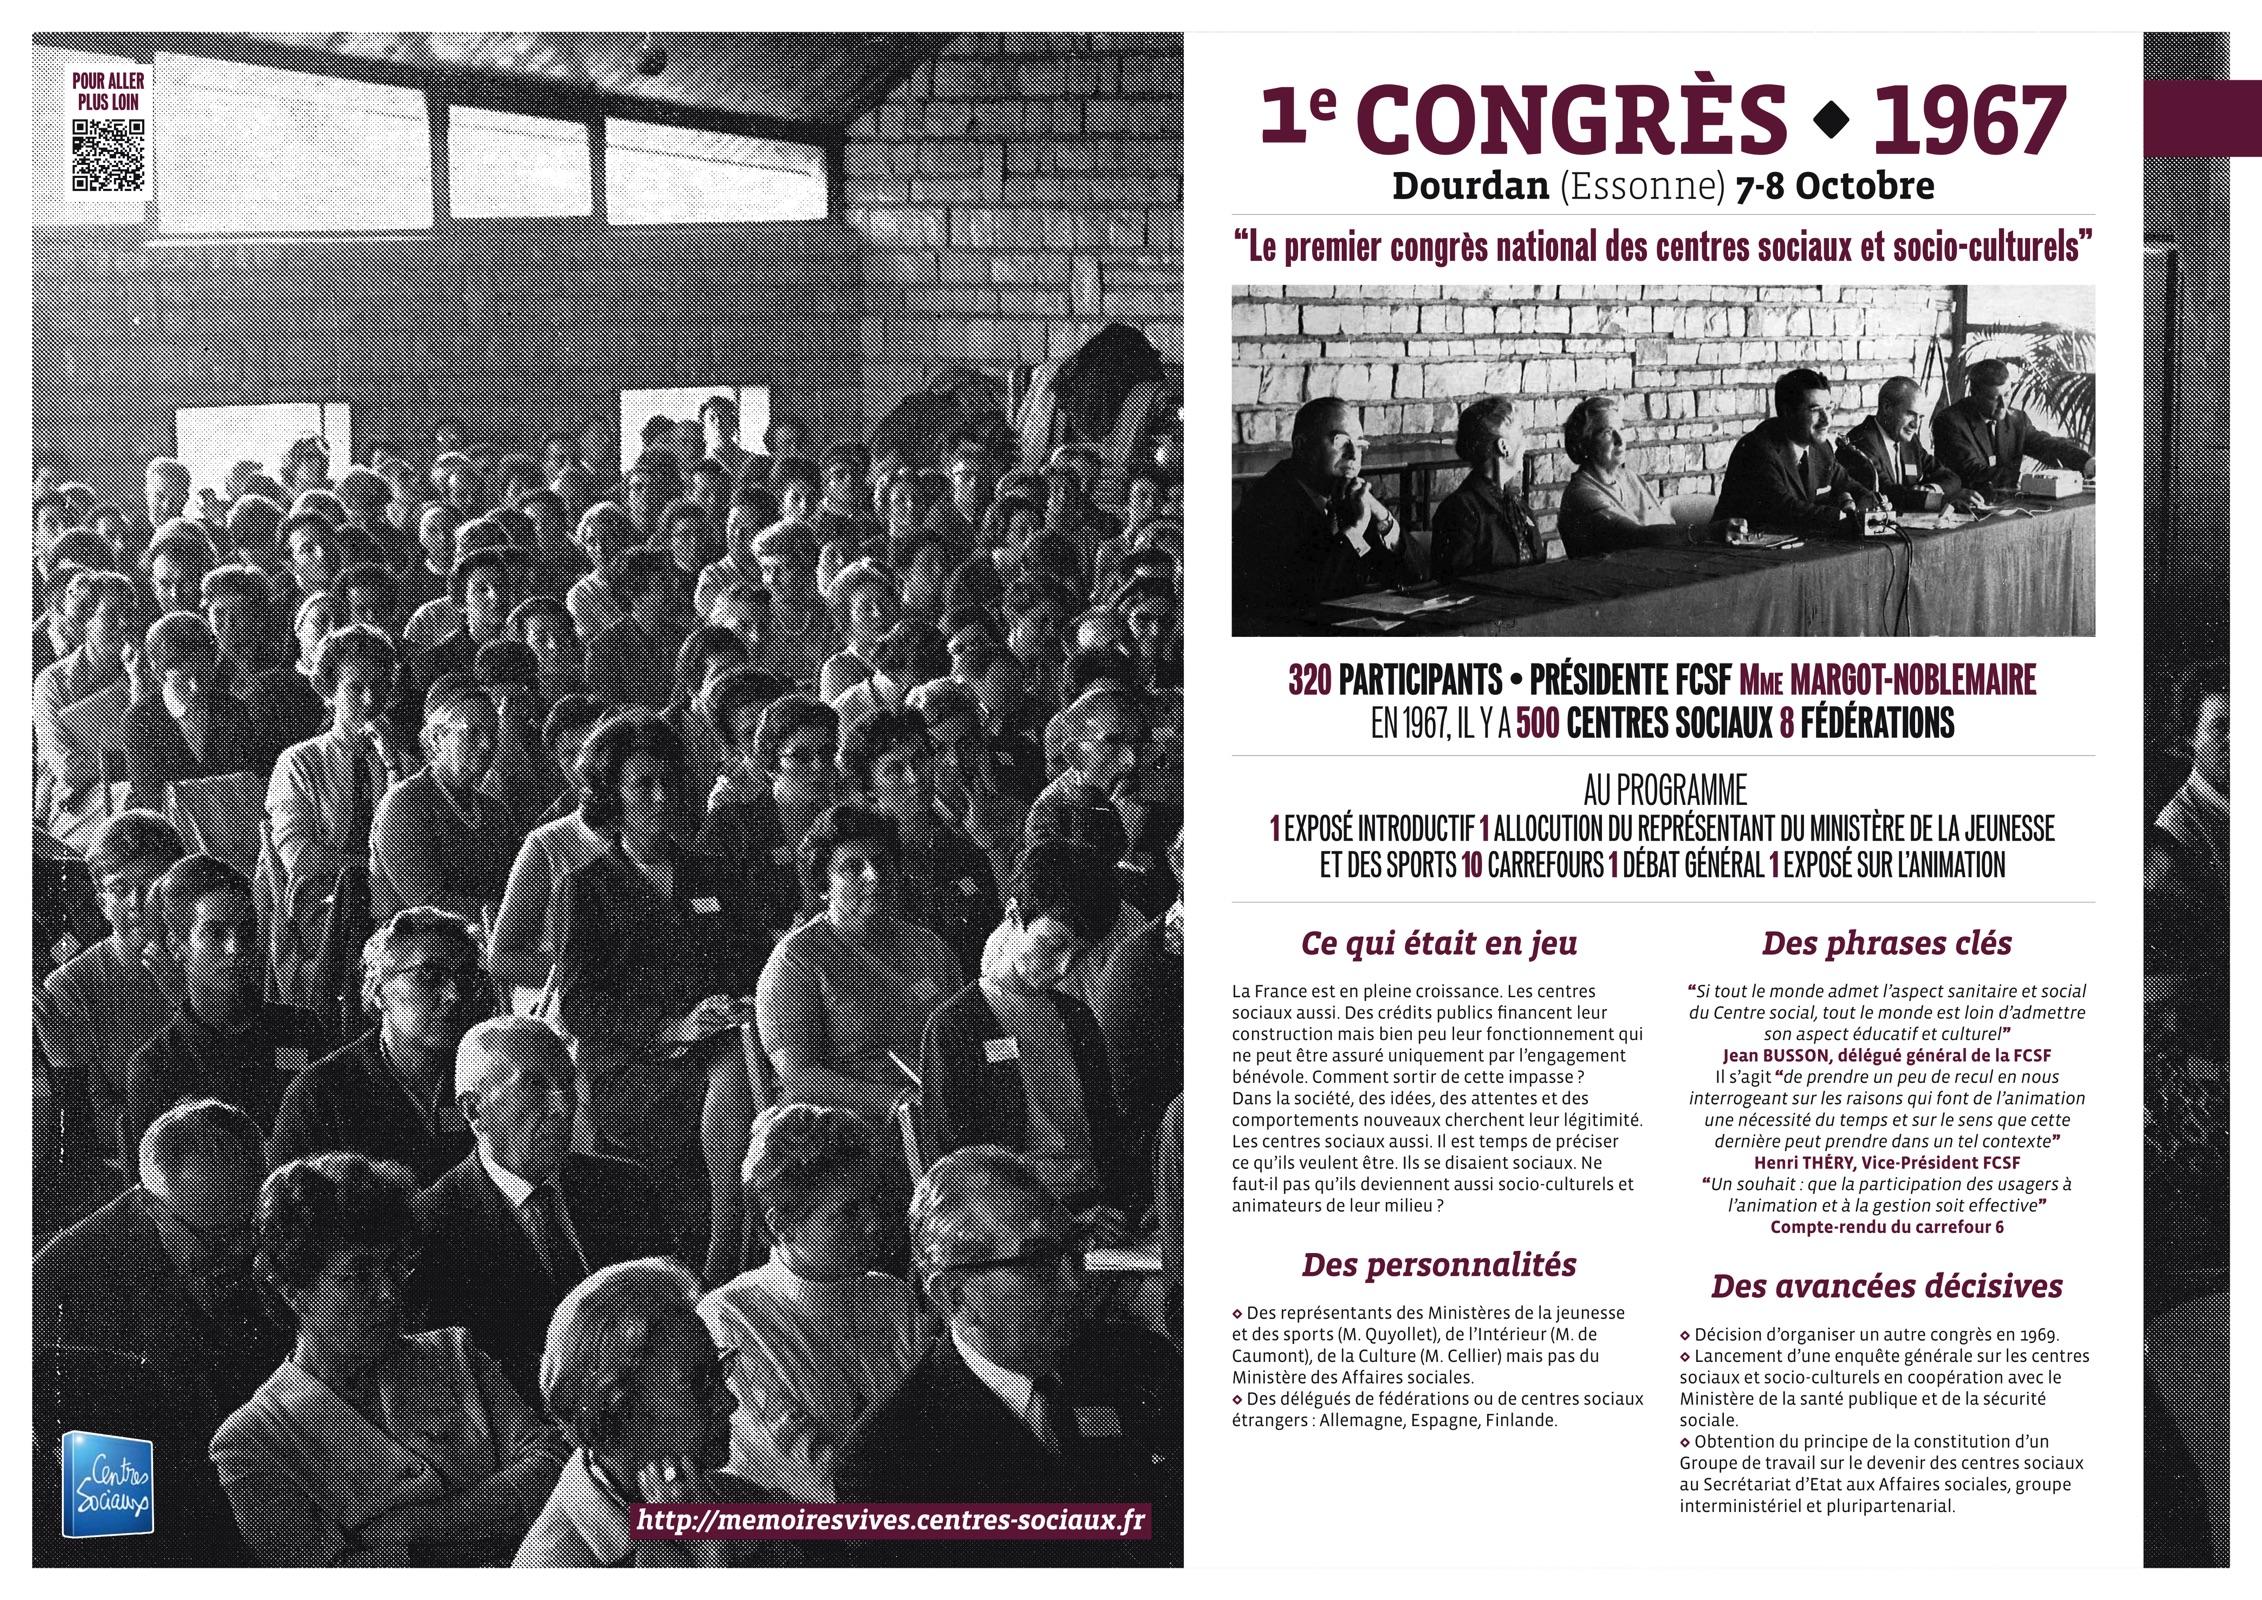 1er Congrès